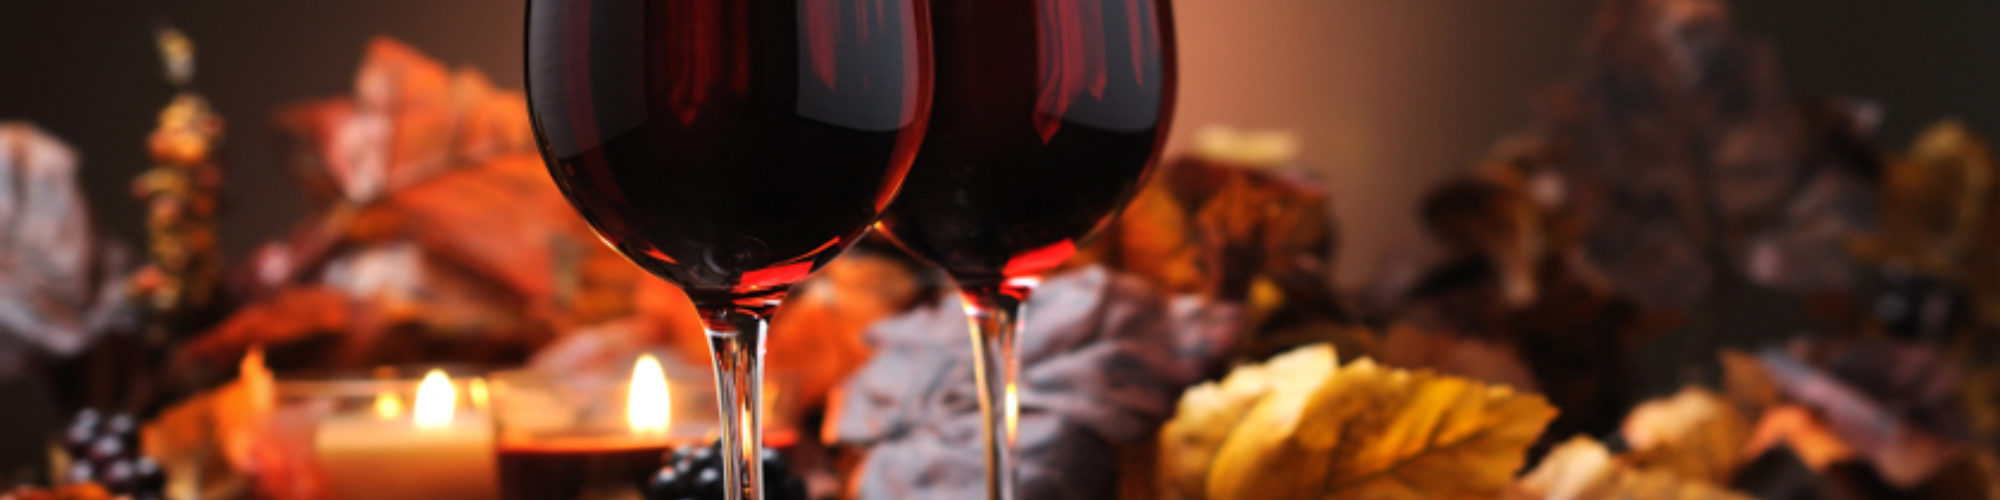 Thanksgiving Food Wine